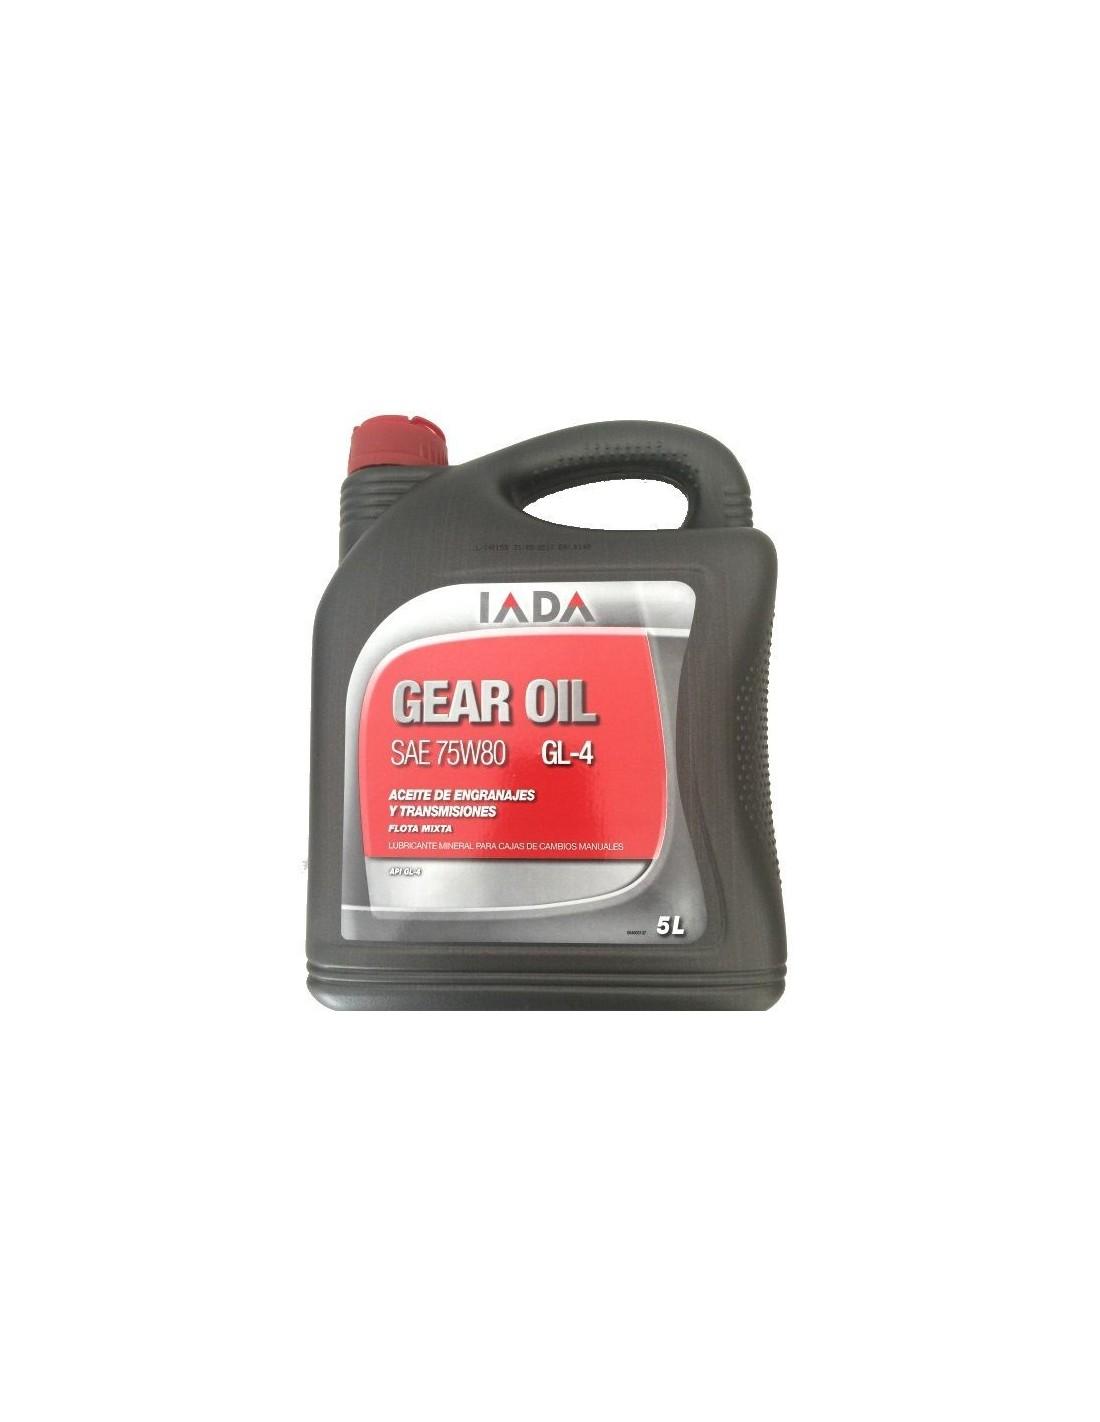 Mazda long life gear oil gl 4 5